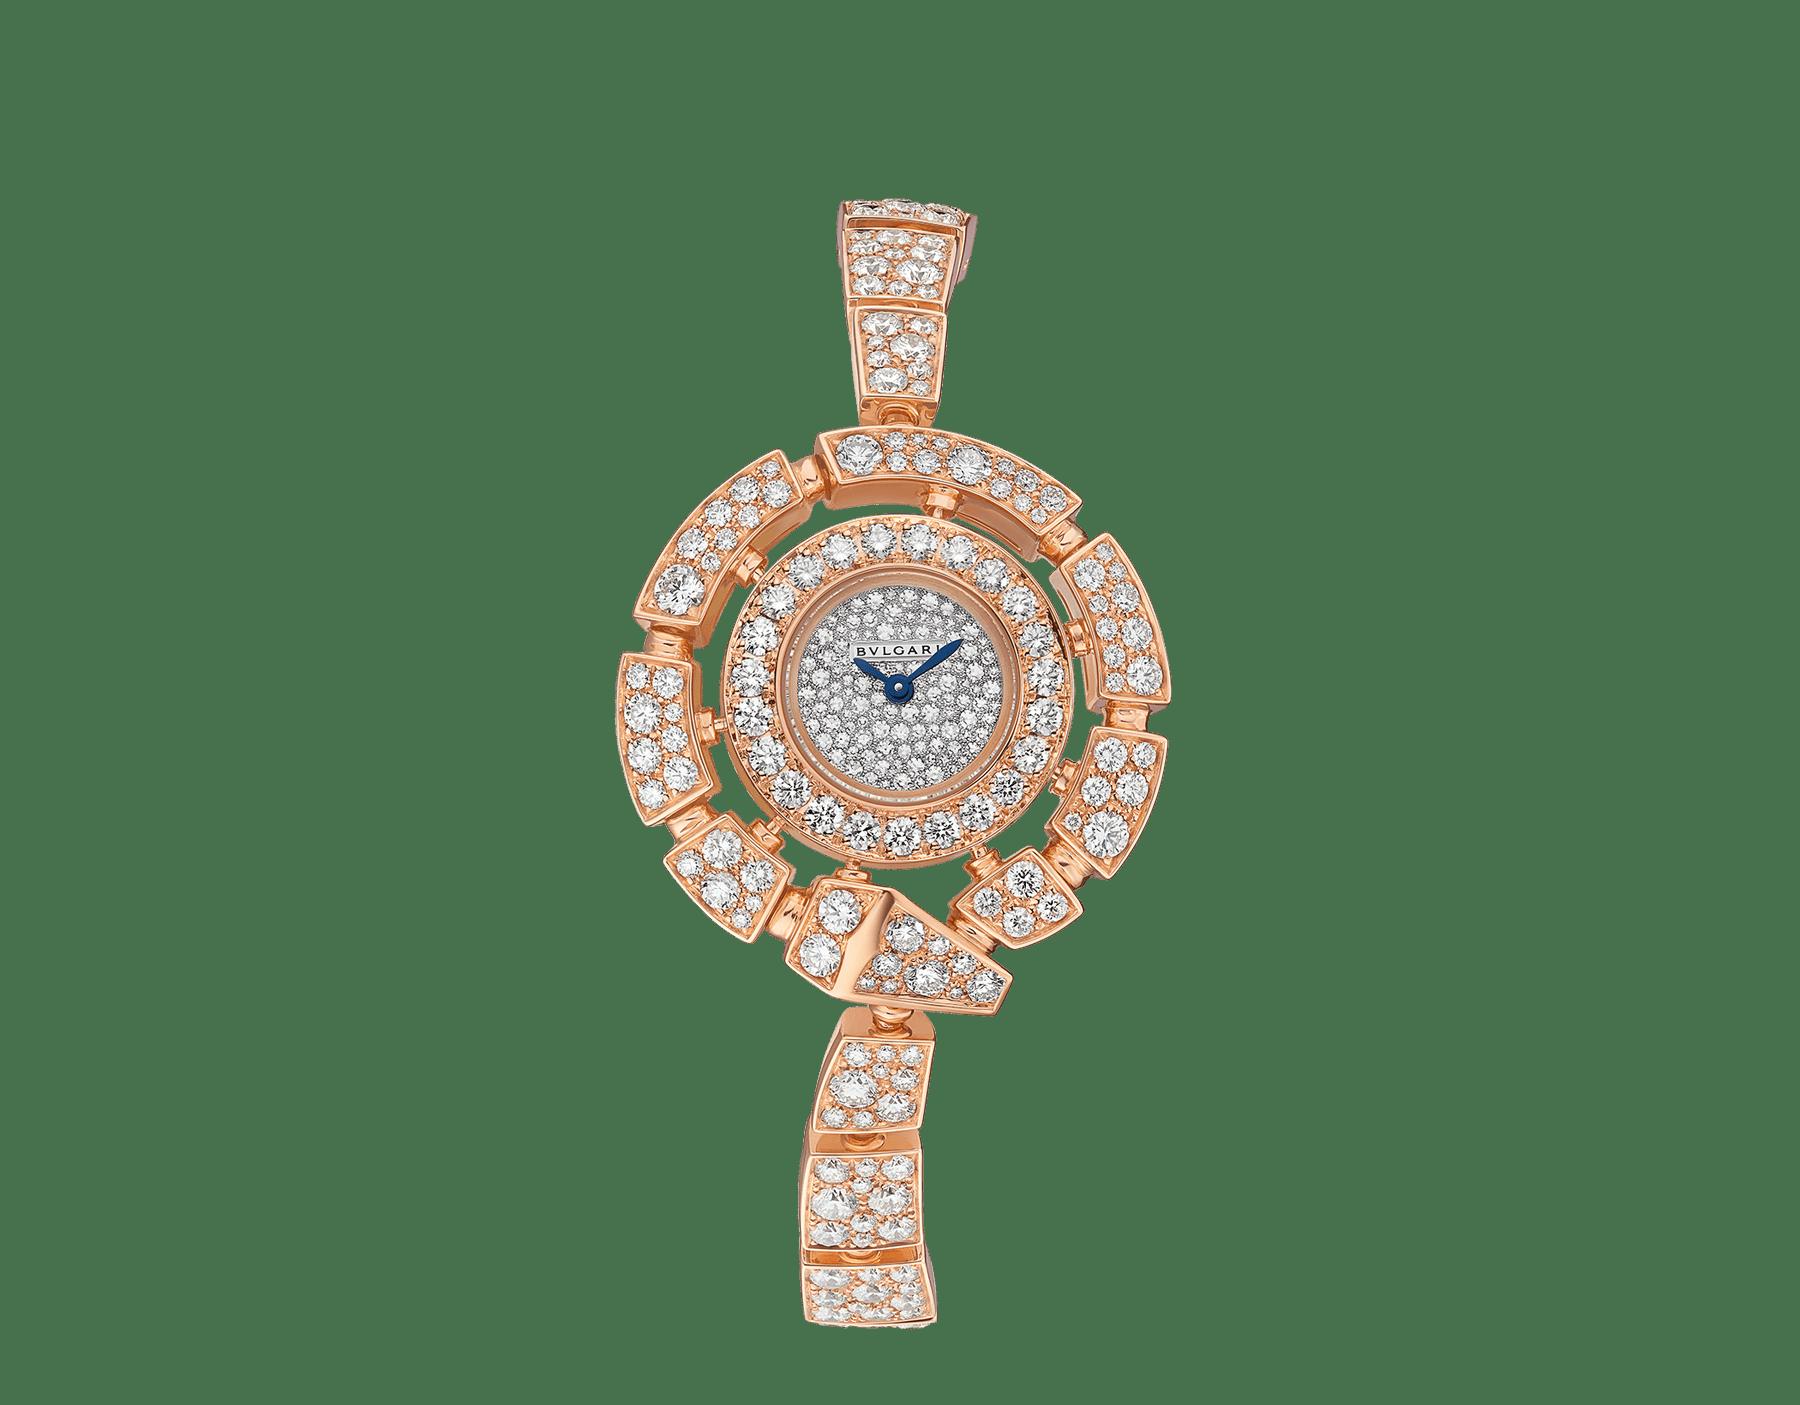 Serpenti Incantati 腕錶,18K 玫瑰金錶殼和錶帶鑲飾明亮型切割鑽石,雪花式密鑲鑽石錶盤。 102673 image 1